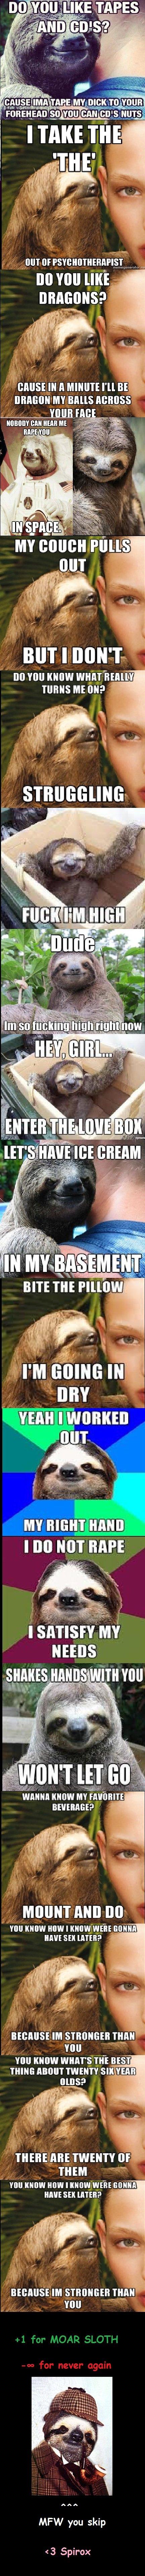 Sloth Comp. tons of slothy goodness. Ink: tlg? Jis, 69: 52 BO VIII] LIKE . CHINISE III ll MINUTE I' ll BE MY RAILS MASS MIR HI I if I I In i Grmmar.', mans HIE  Sloth Comp tons of slothy goodness Ink: tlg? Jis 69: 52 BO VIII] LIKE CHINISE III ll MINUTE I' BE MY RAILS MASS MIR HI I if In i Grmmar ' mans HIE